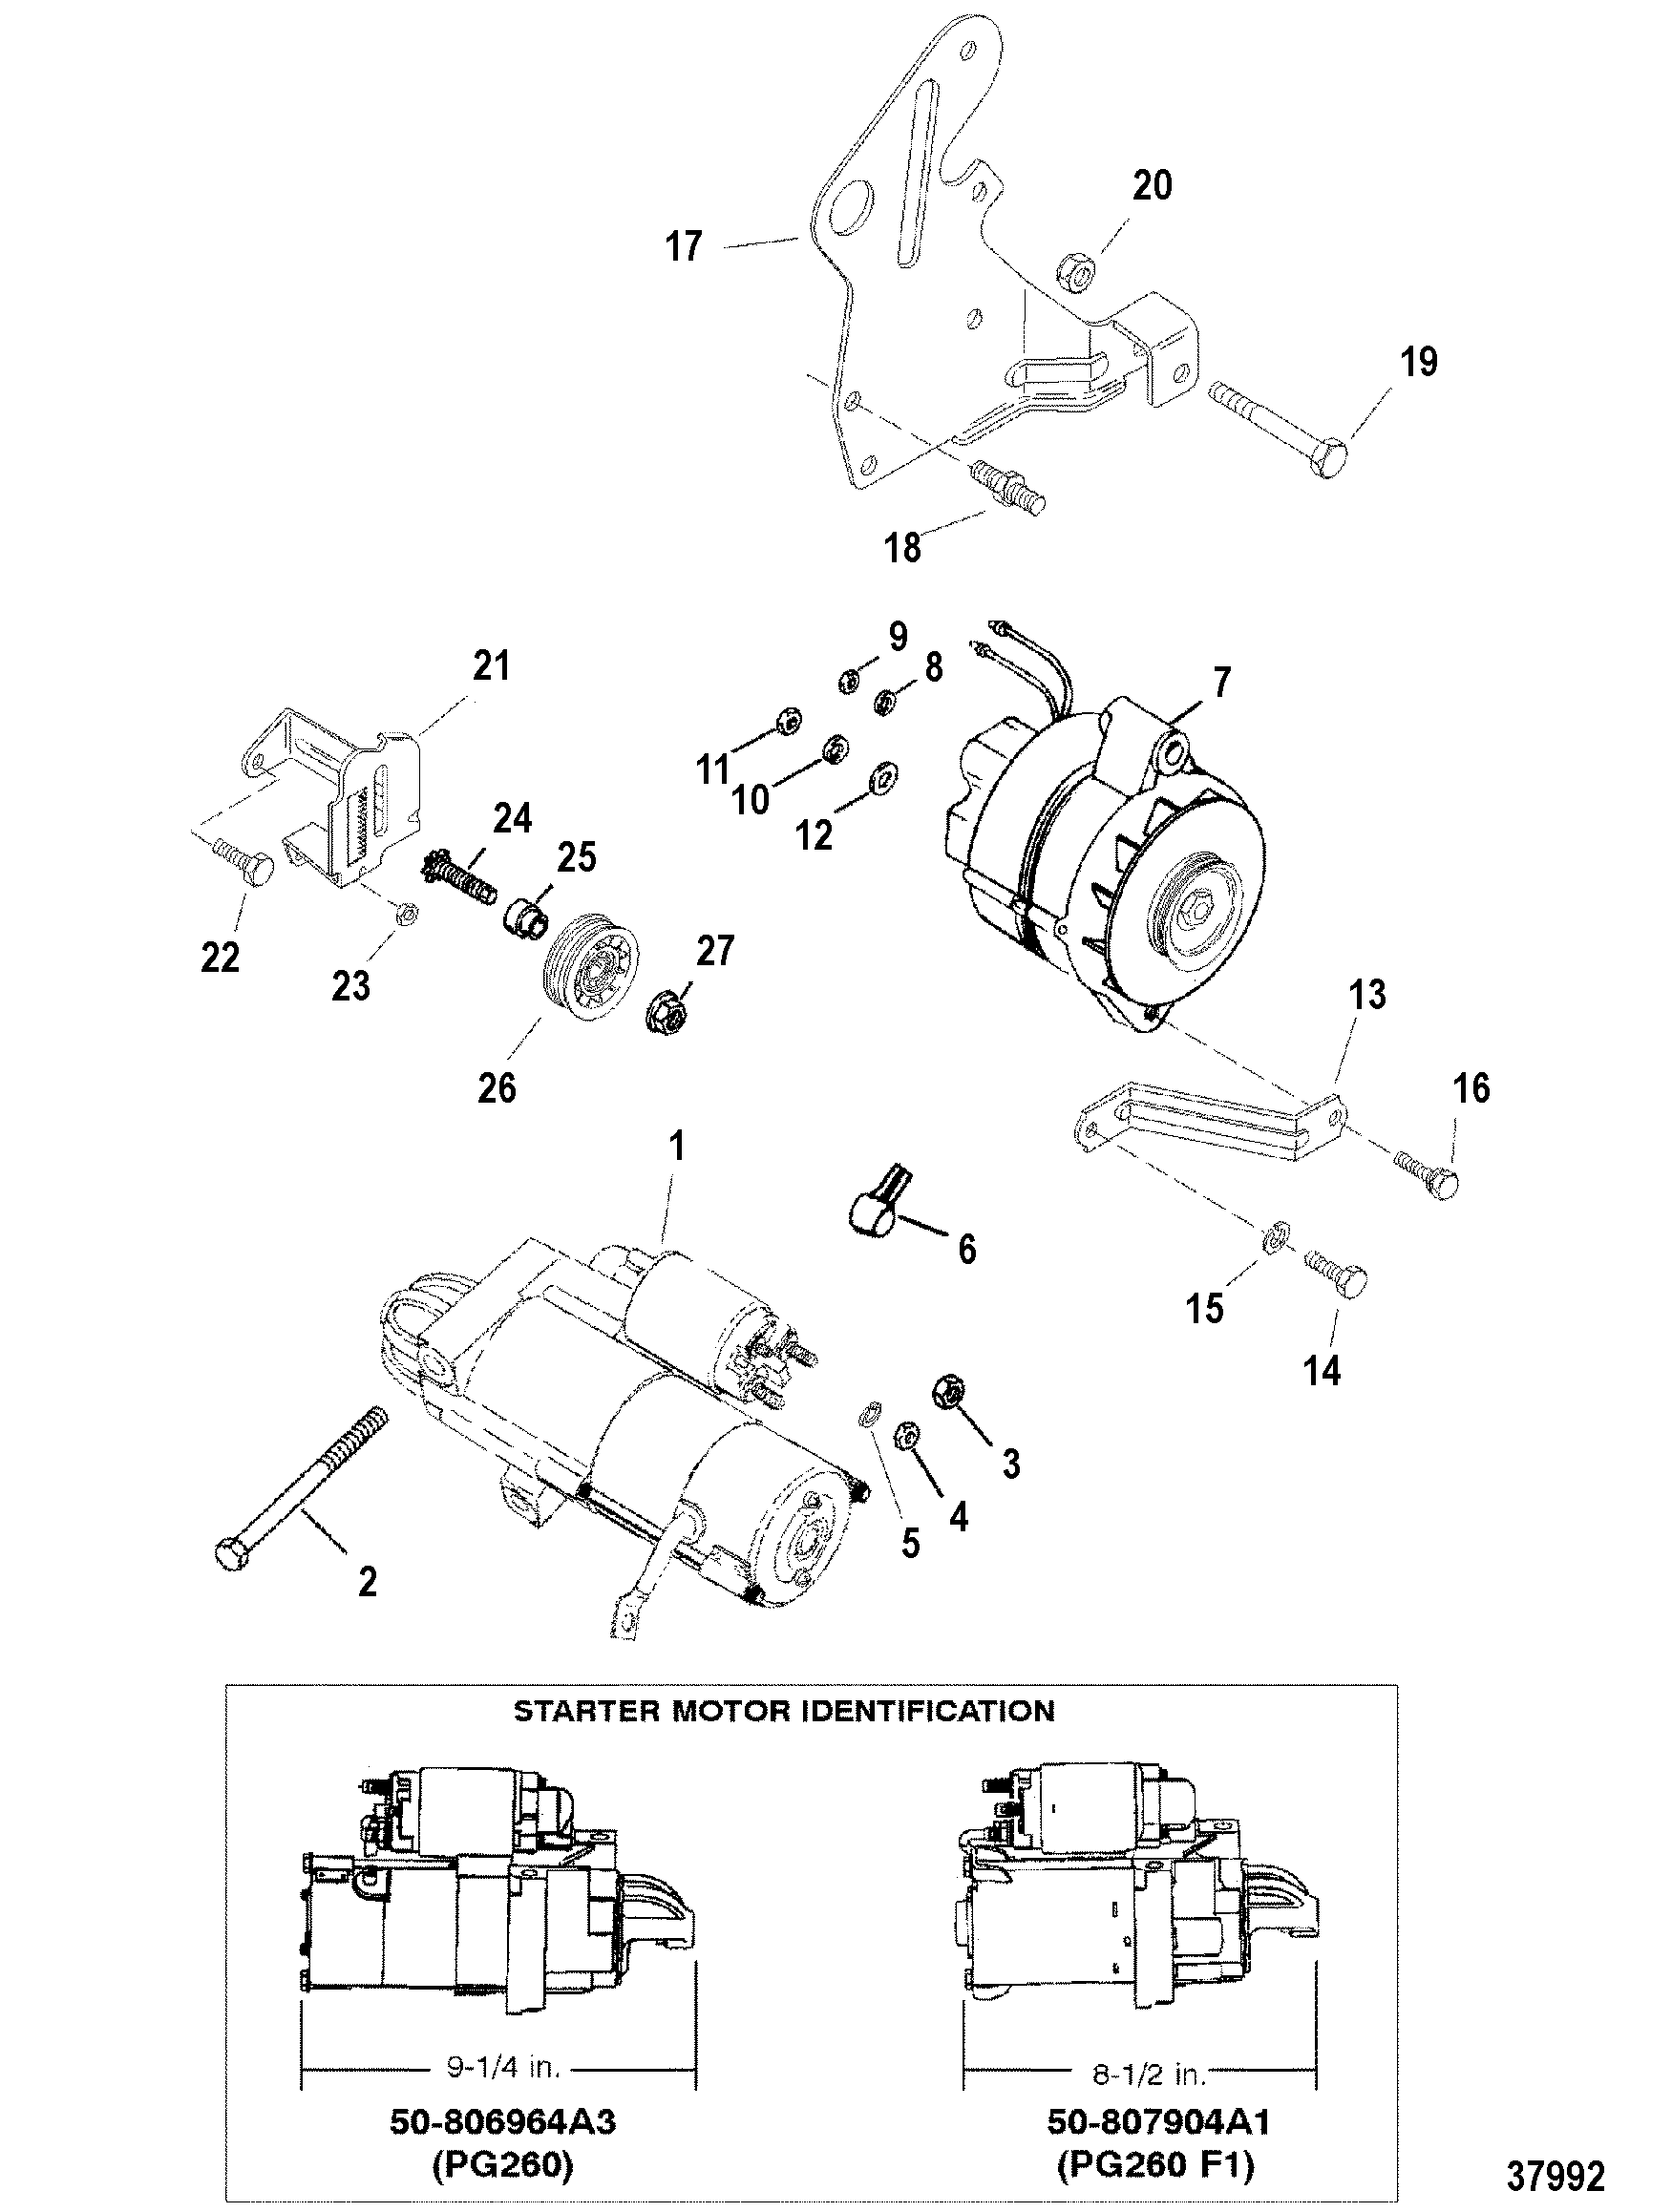 Authorvicky Keyword Schematic Diagram Clock Circuit Fromseekic